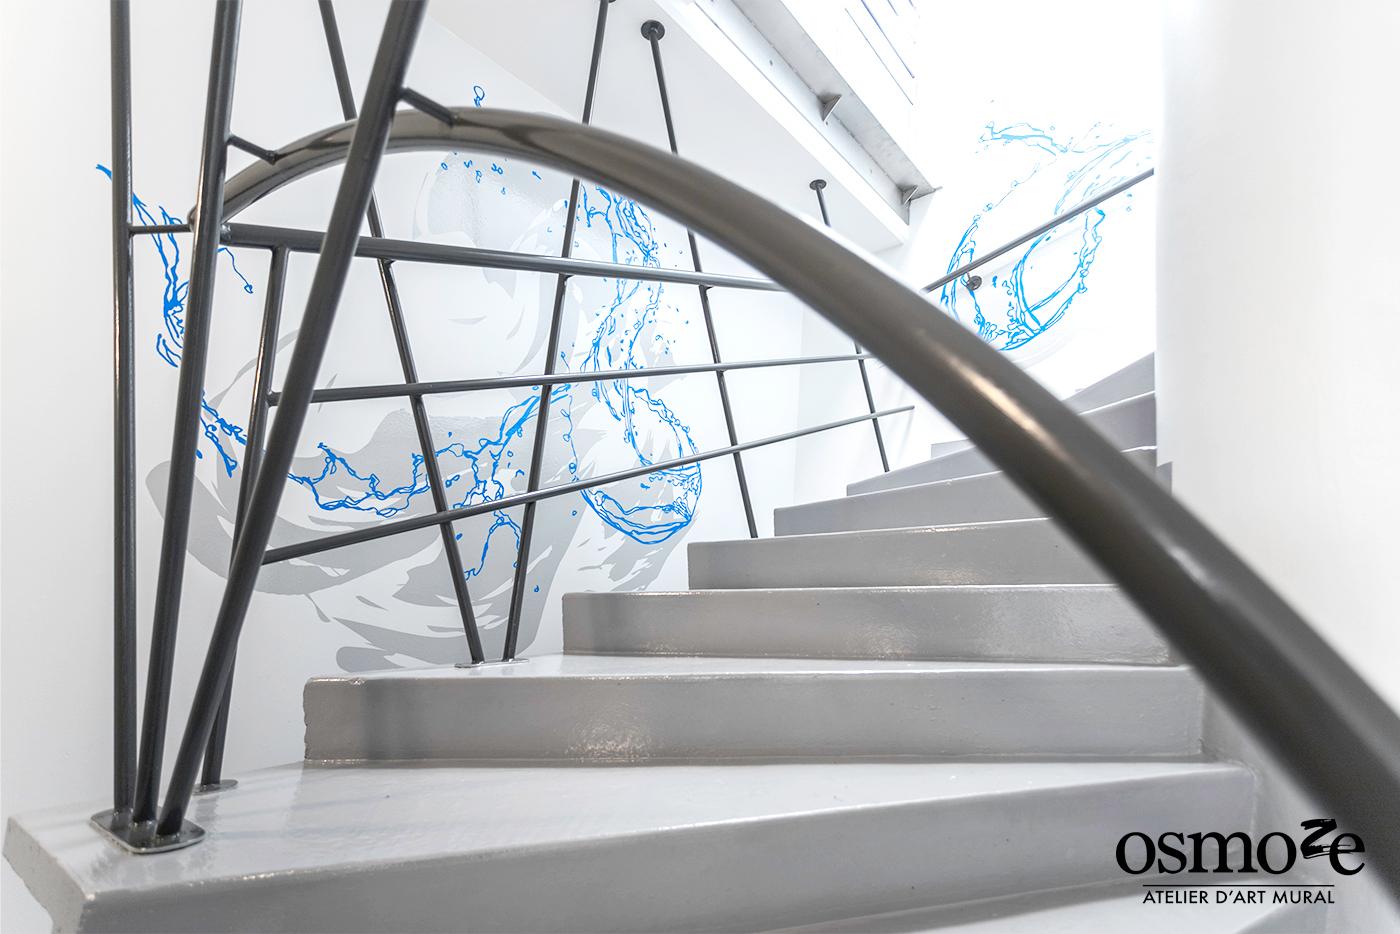 Décoration murale > Osmoze > Fresque design > Wattwiller